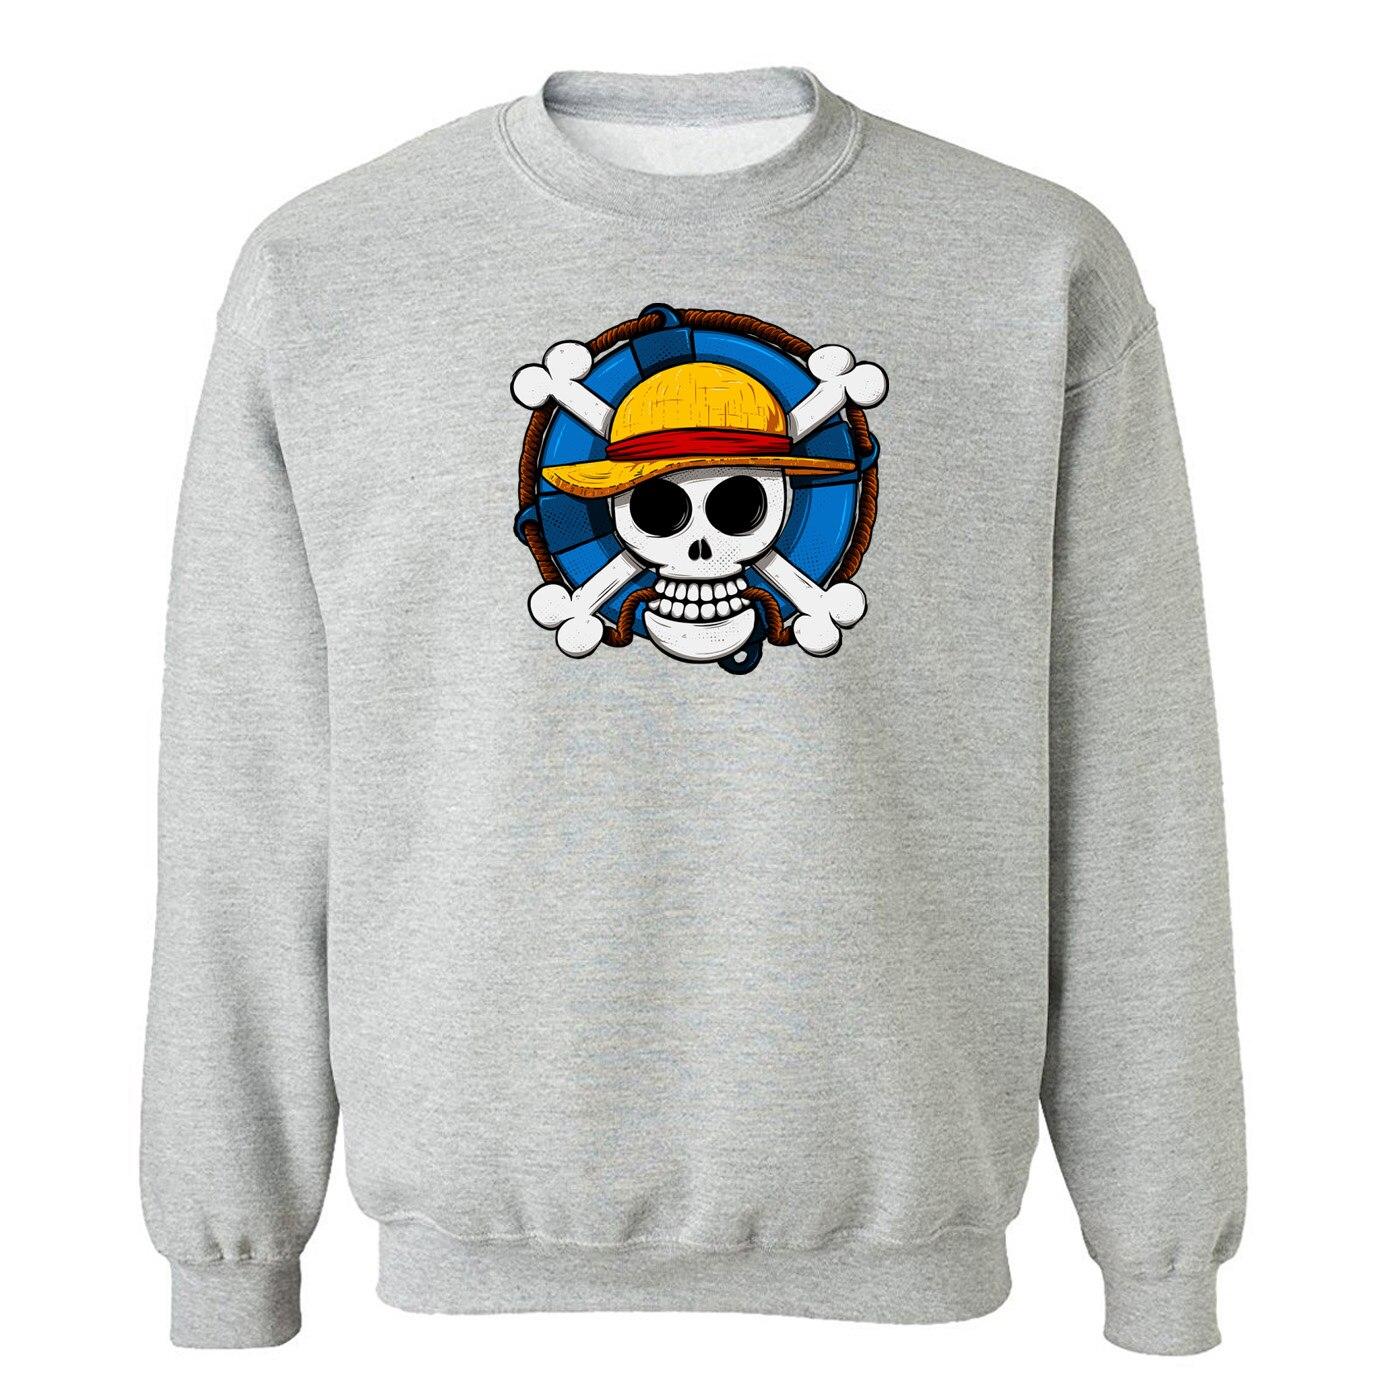 One Piece Skull Hoodies Men Sweatshirts Funny Hip Hop Sweatshirt Harajuku Autumn New Tracksuit Hip Hop Mens Japanese Streetwear